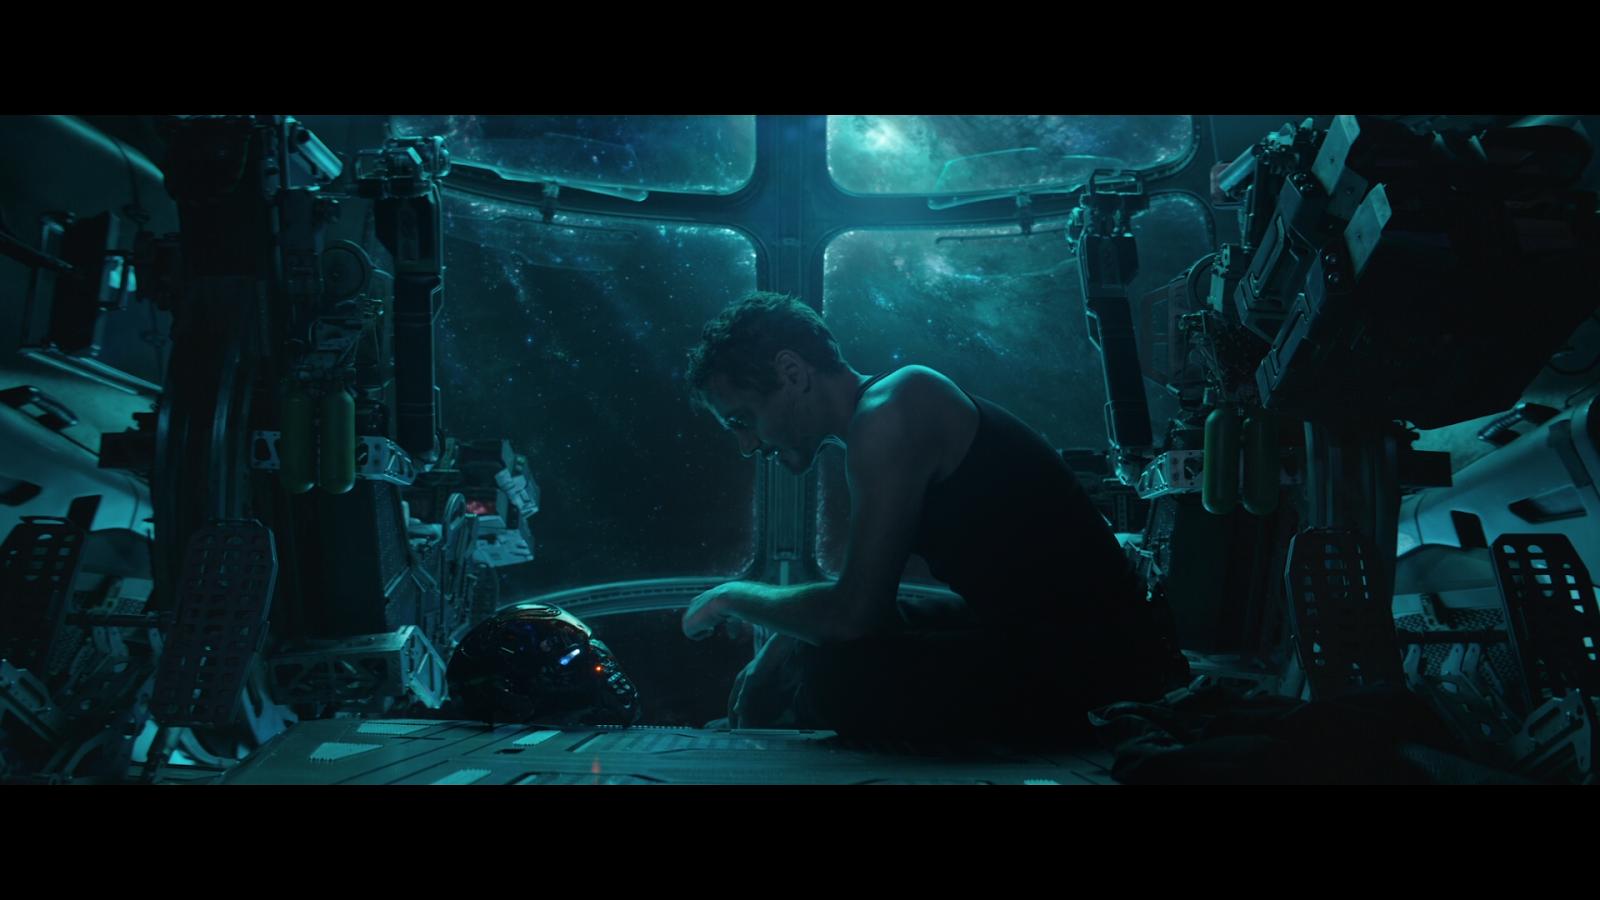 Avengers Endgame (2019) Full HD 1080p BD25 LATINO 1